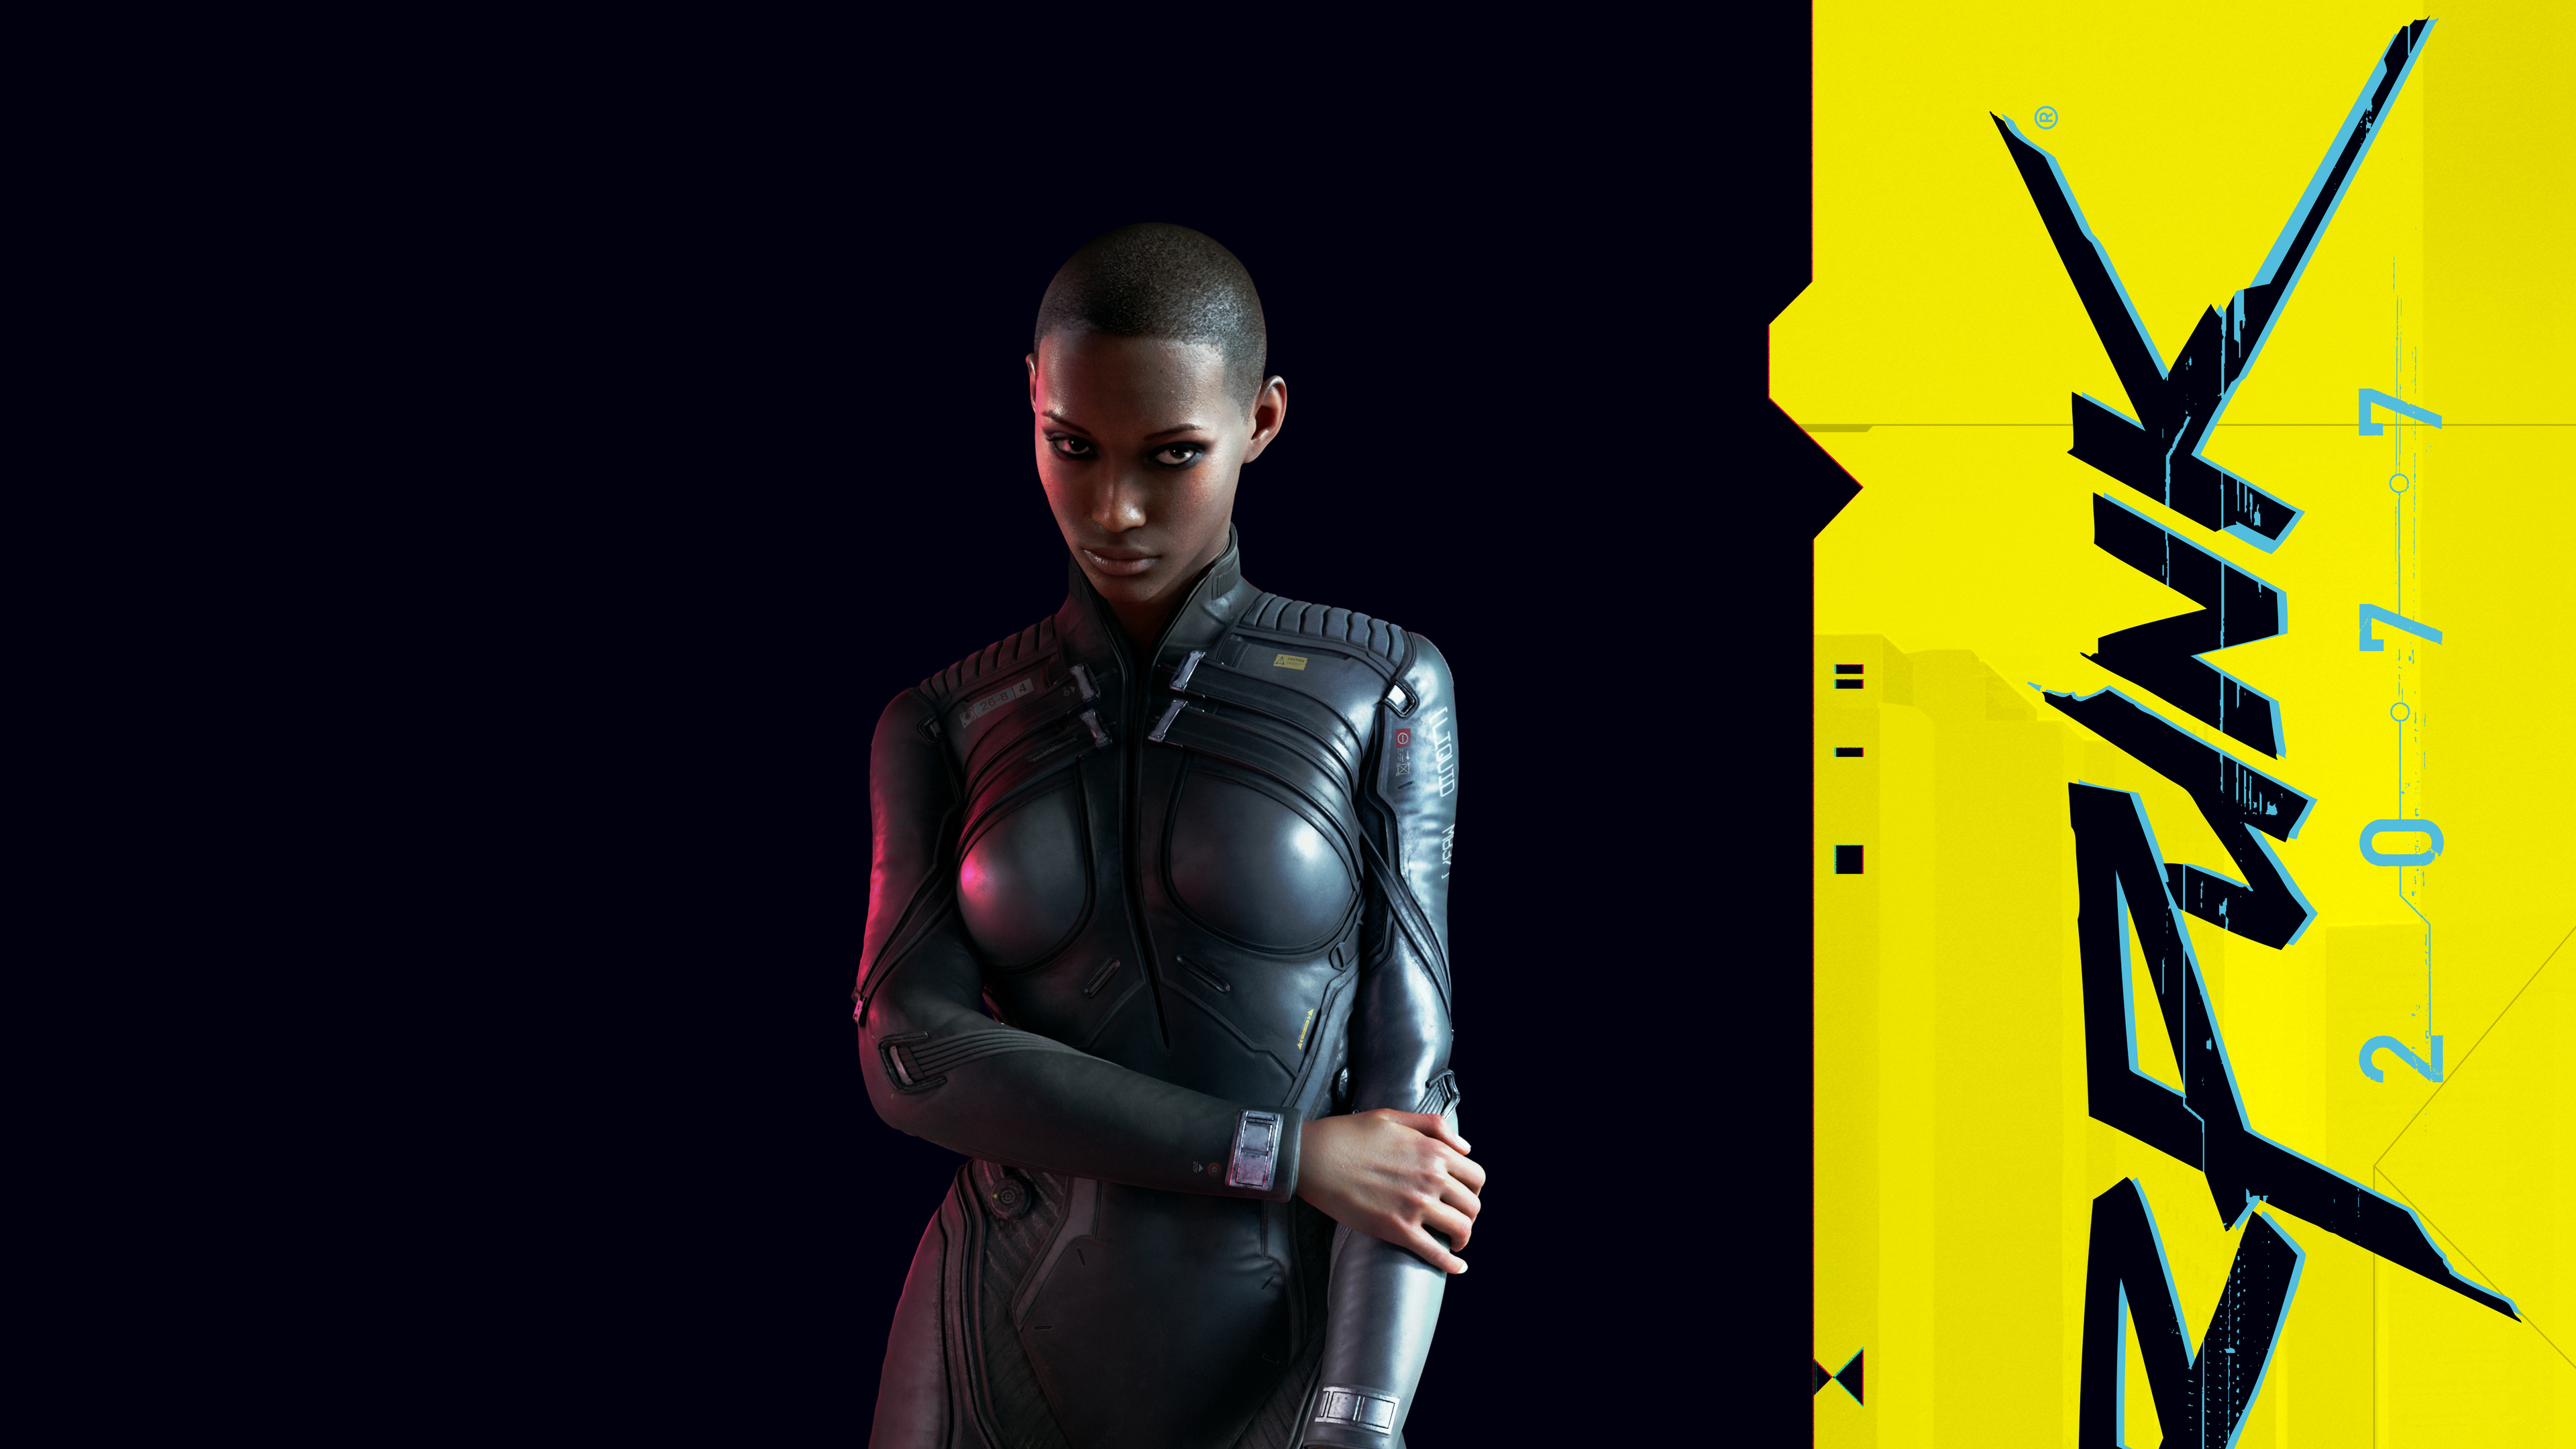 2019 cyberpunk 2077 game 1568056671 - 2019 Cyberpunk 2077 Game - xbox games wallpapers, ps games wallpapers, pc games wallpapers, hd-wallpapers, games wallpapers, cyberpunk 2077 wallpapers, 4k-wallpapers